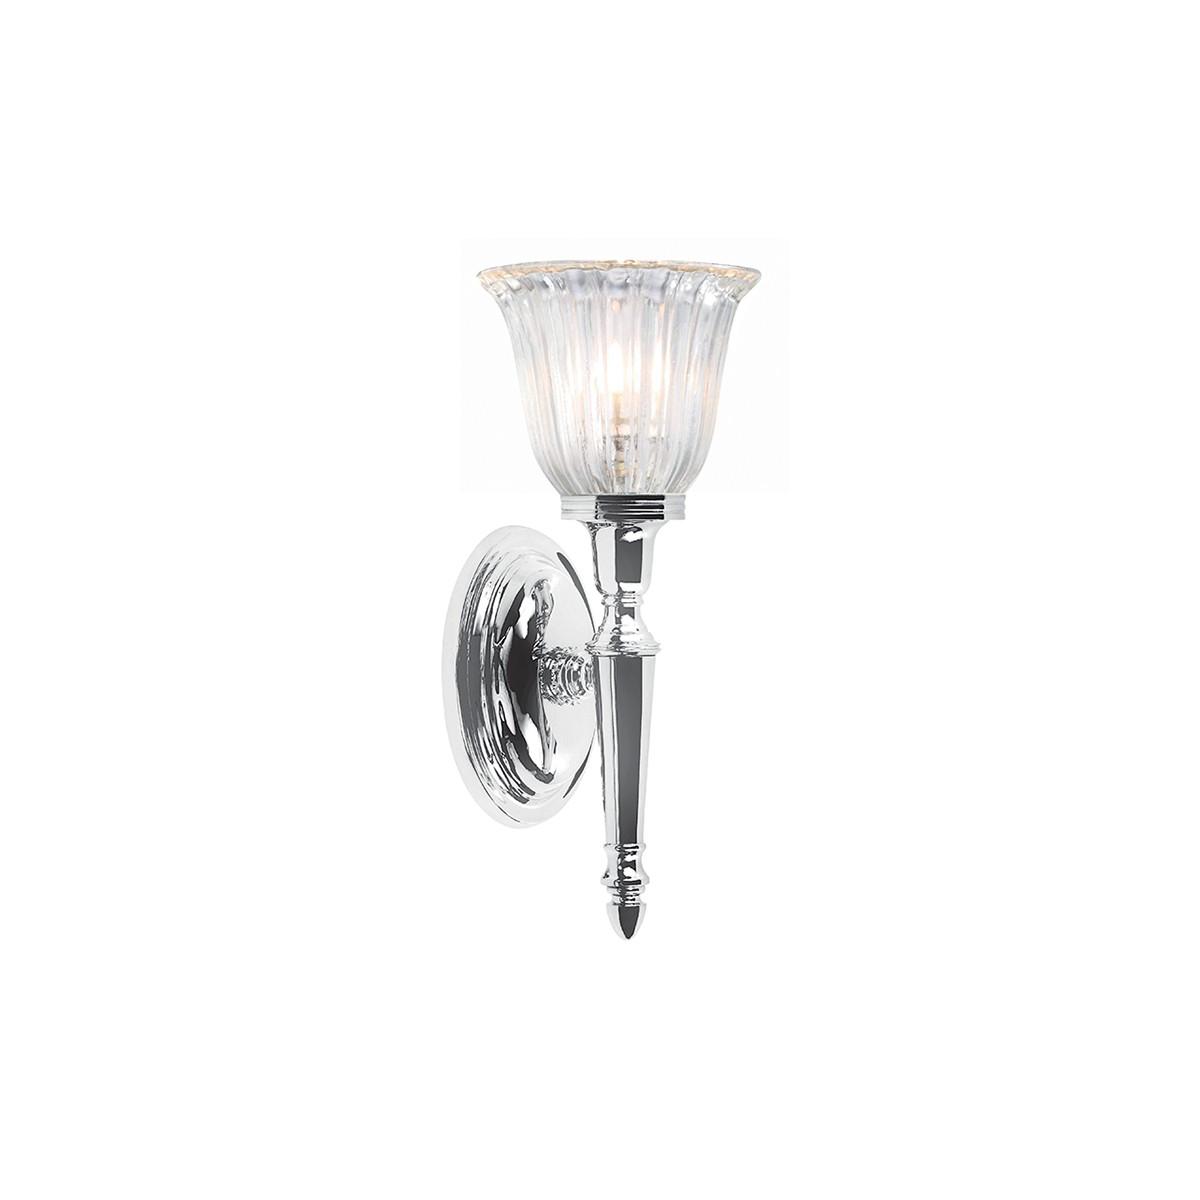 Elstead Lighting Interior Kinkiet ŁAZIENKOWY DRYDEN1 1x40W G9 BATH/DRYDEN1 PC